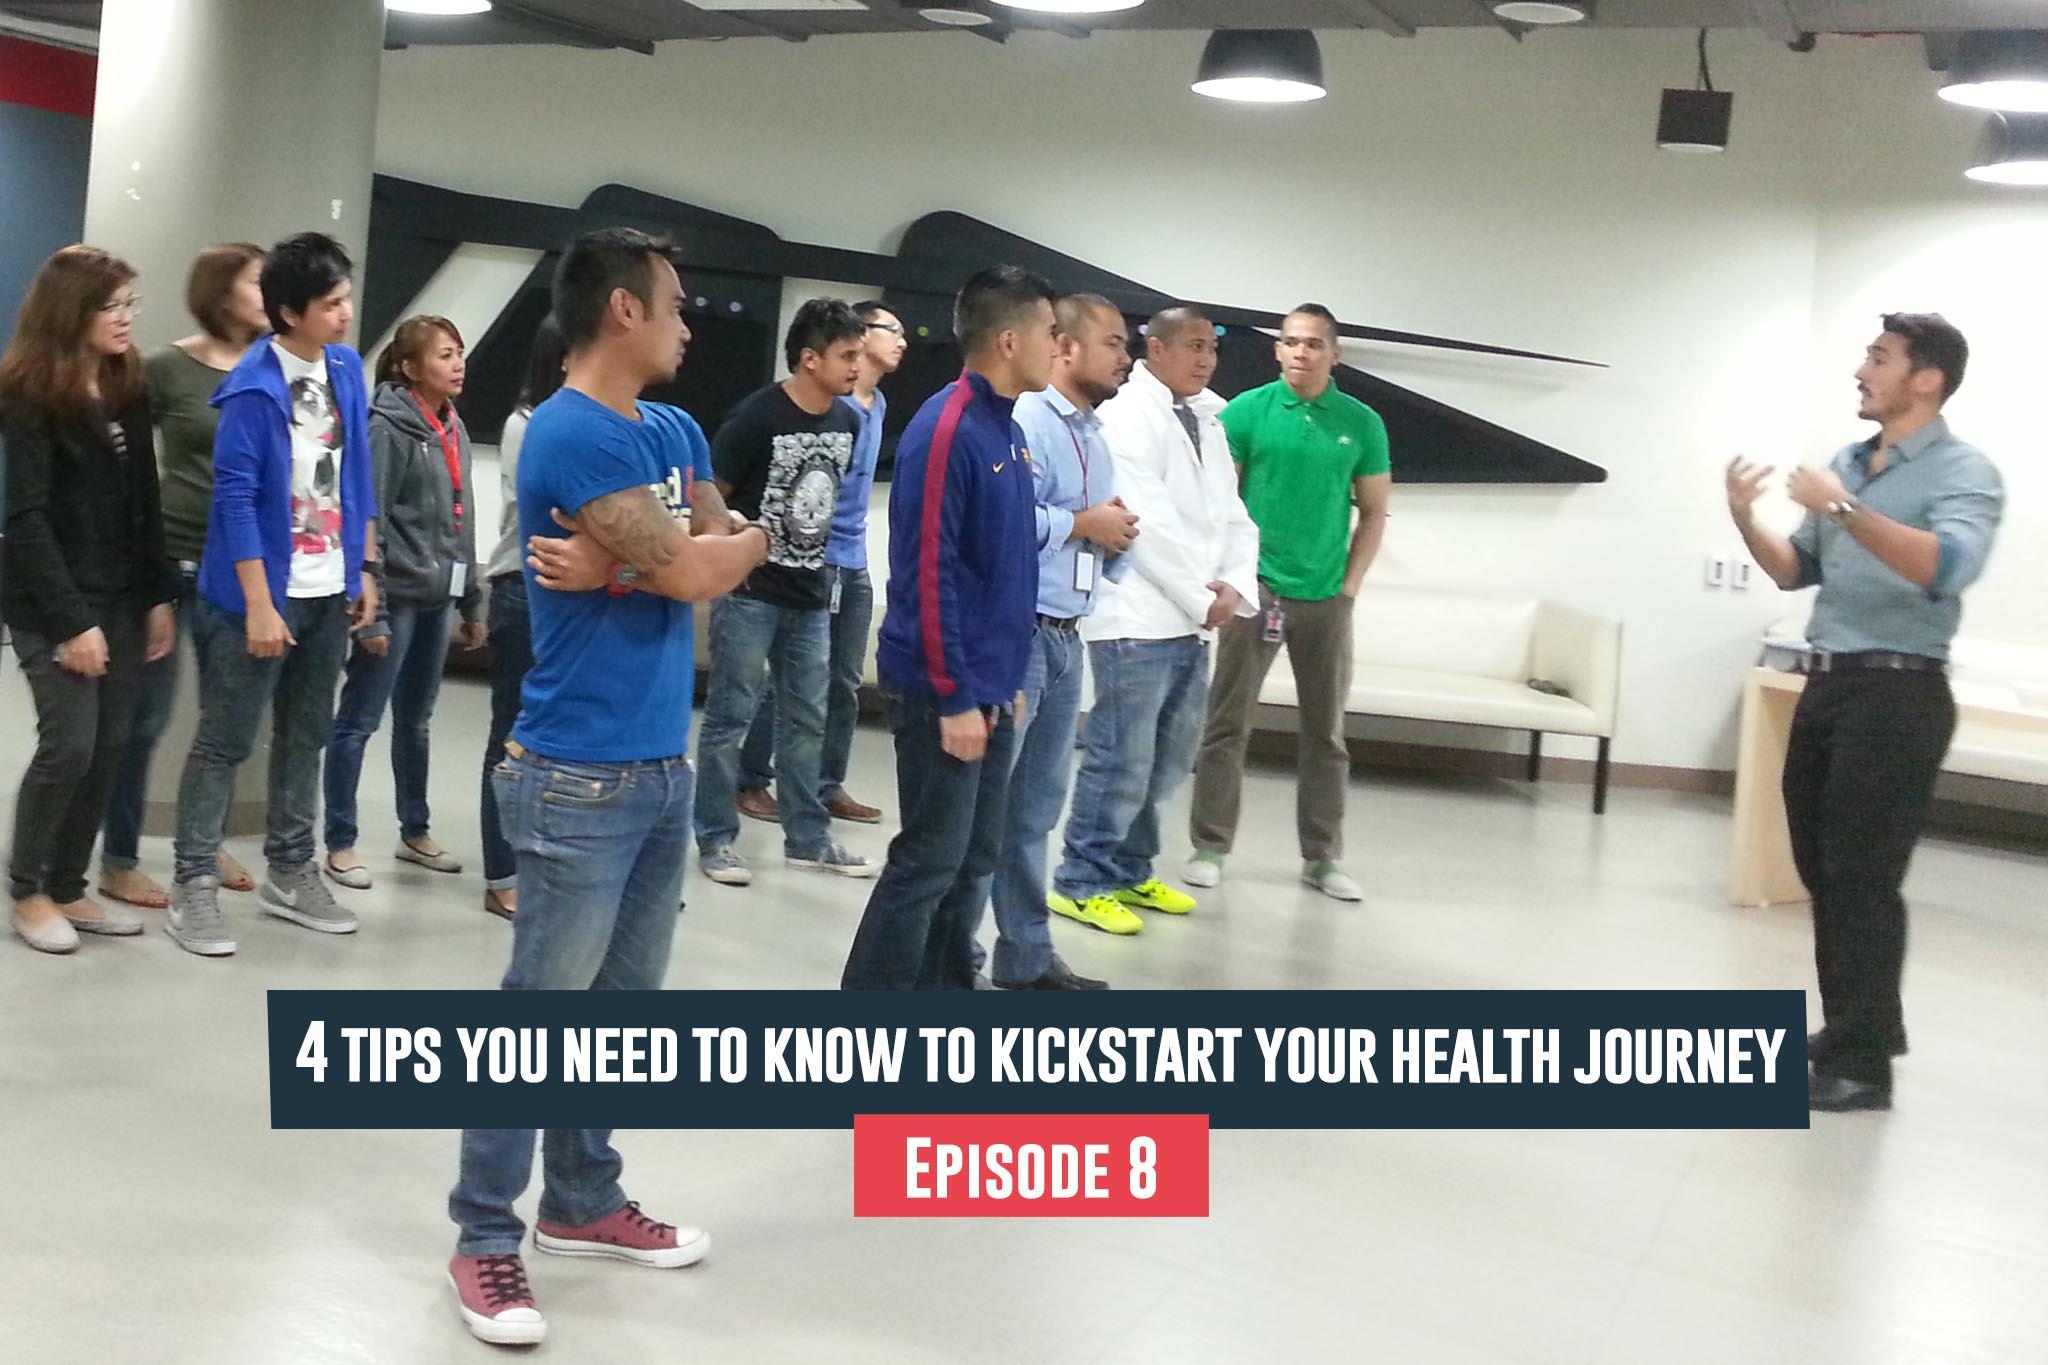 Kickstart Your Health Journey